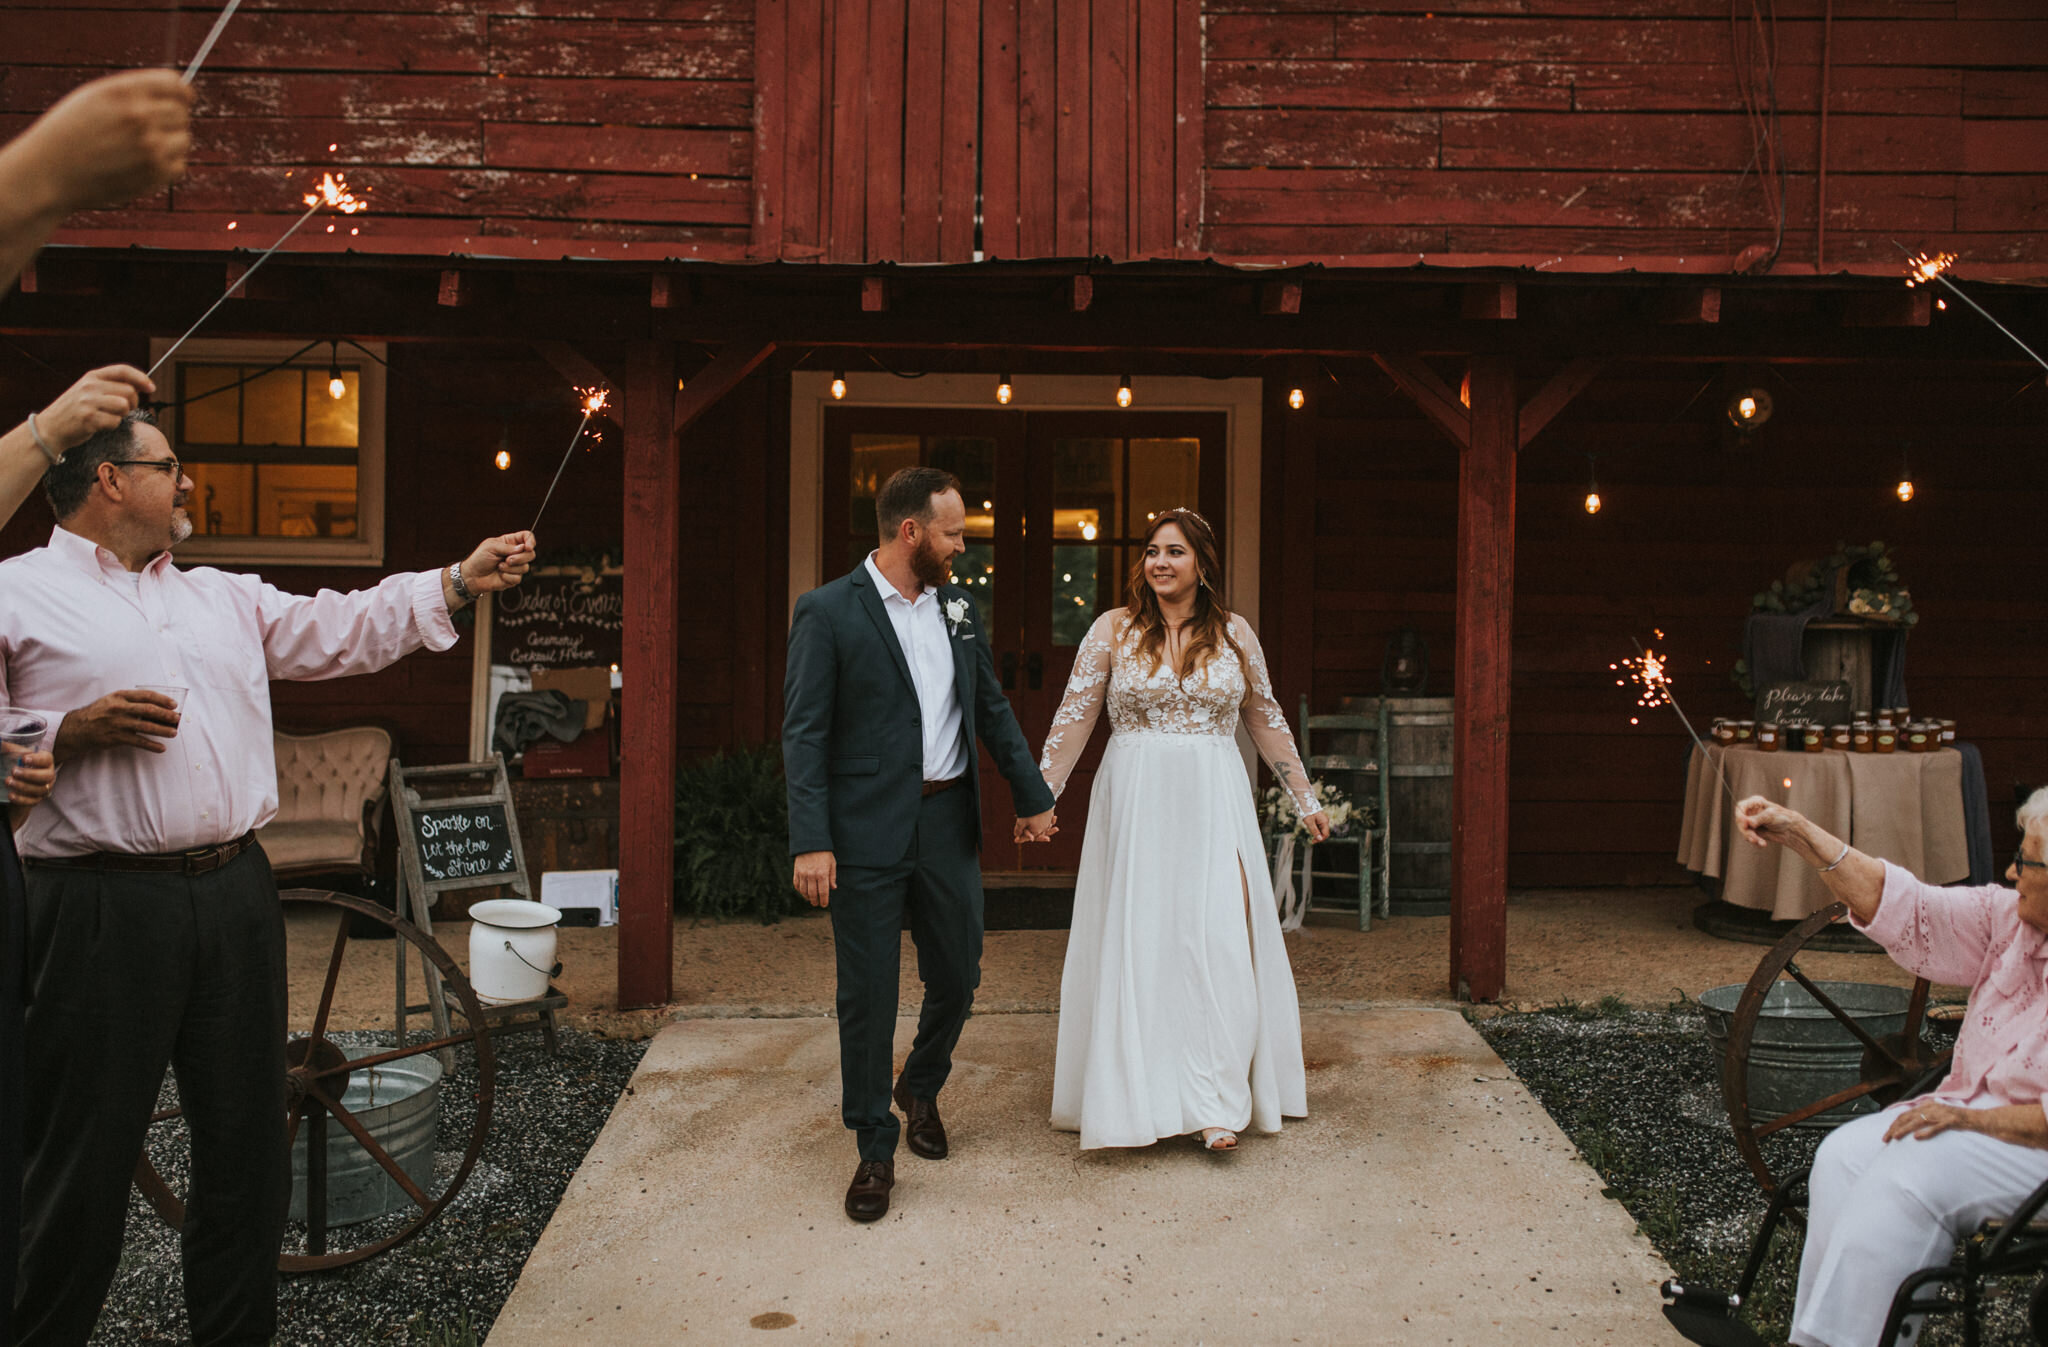 KateMatt-North-Georgia-Wedding-Photographer-Mountain-Laurel-Farm-162.jpg